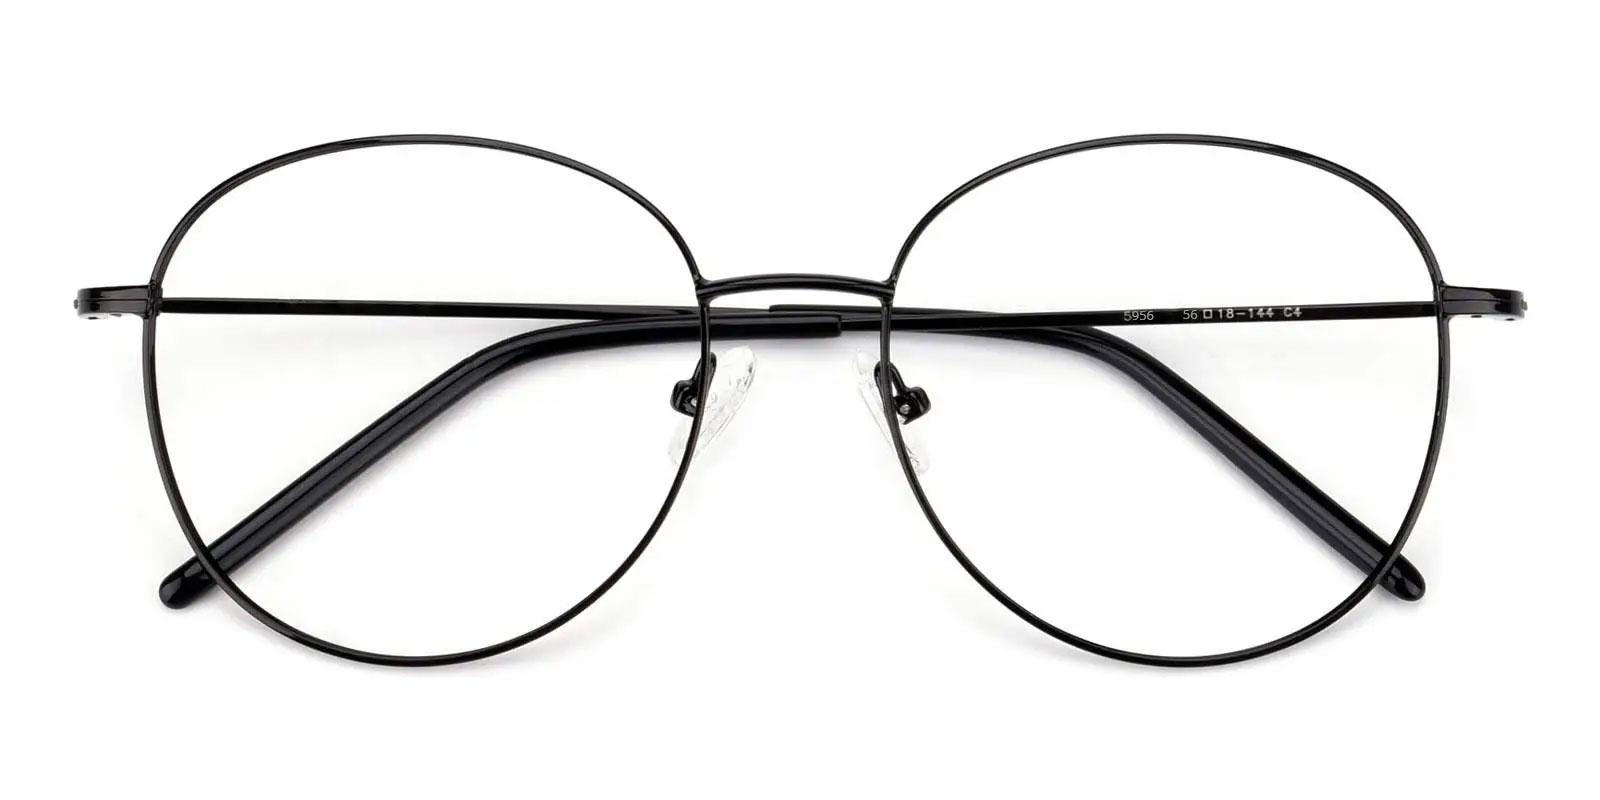 Usman Black Metal Eyeglasses , Fashion , NosePads Frames from ABBE Glasses